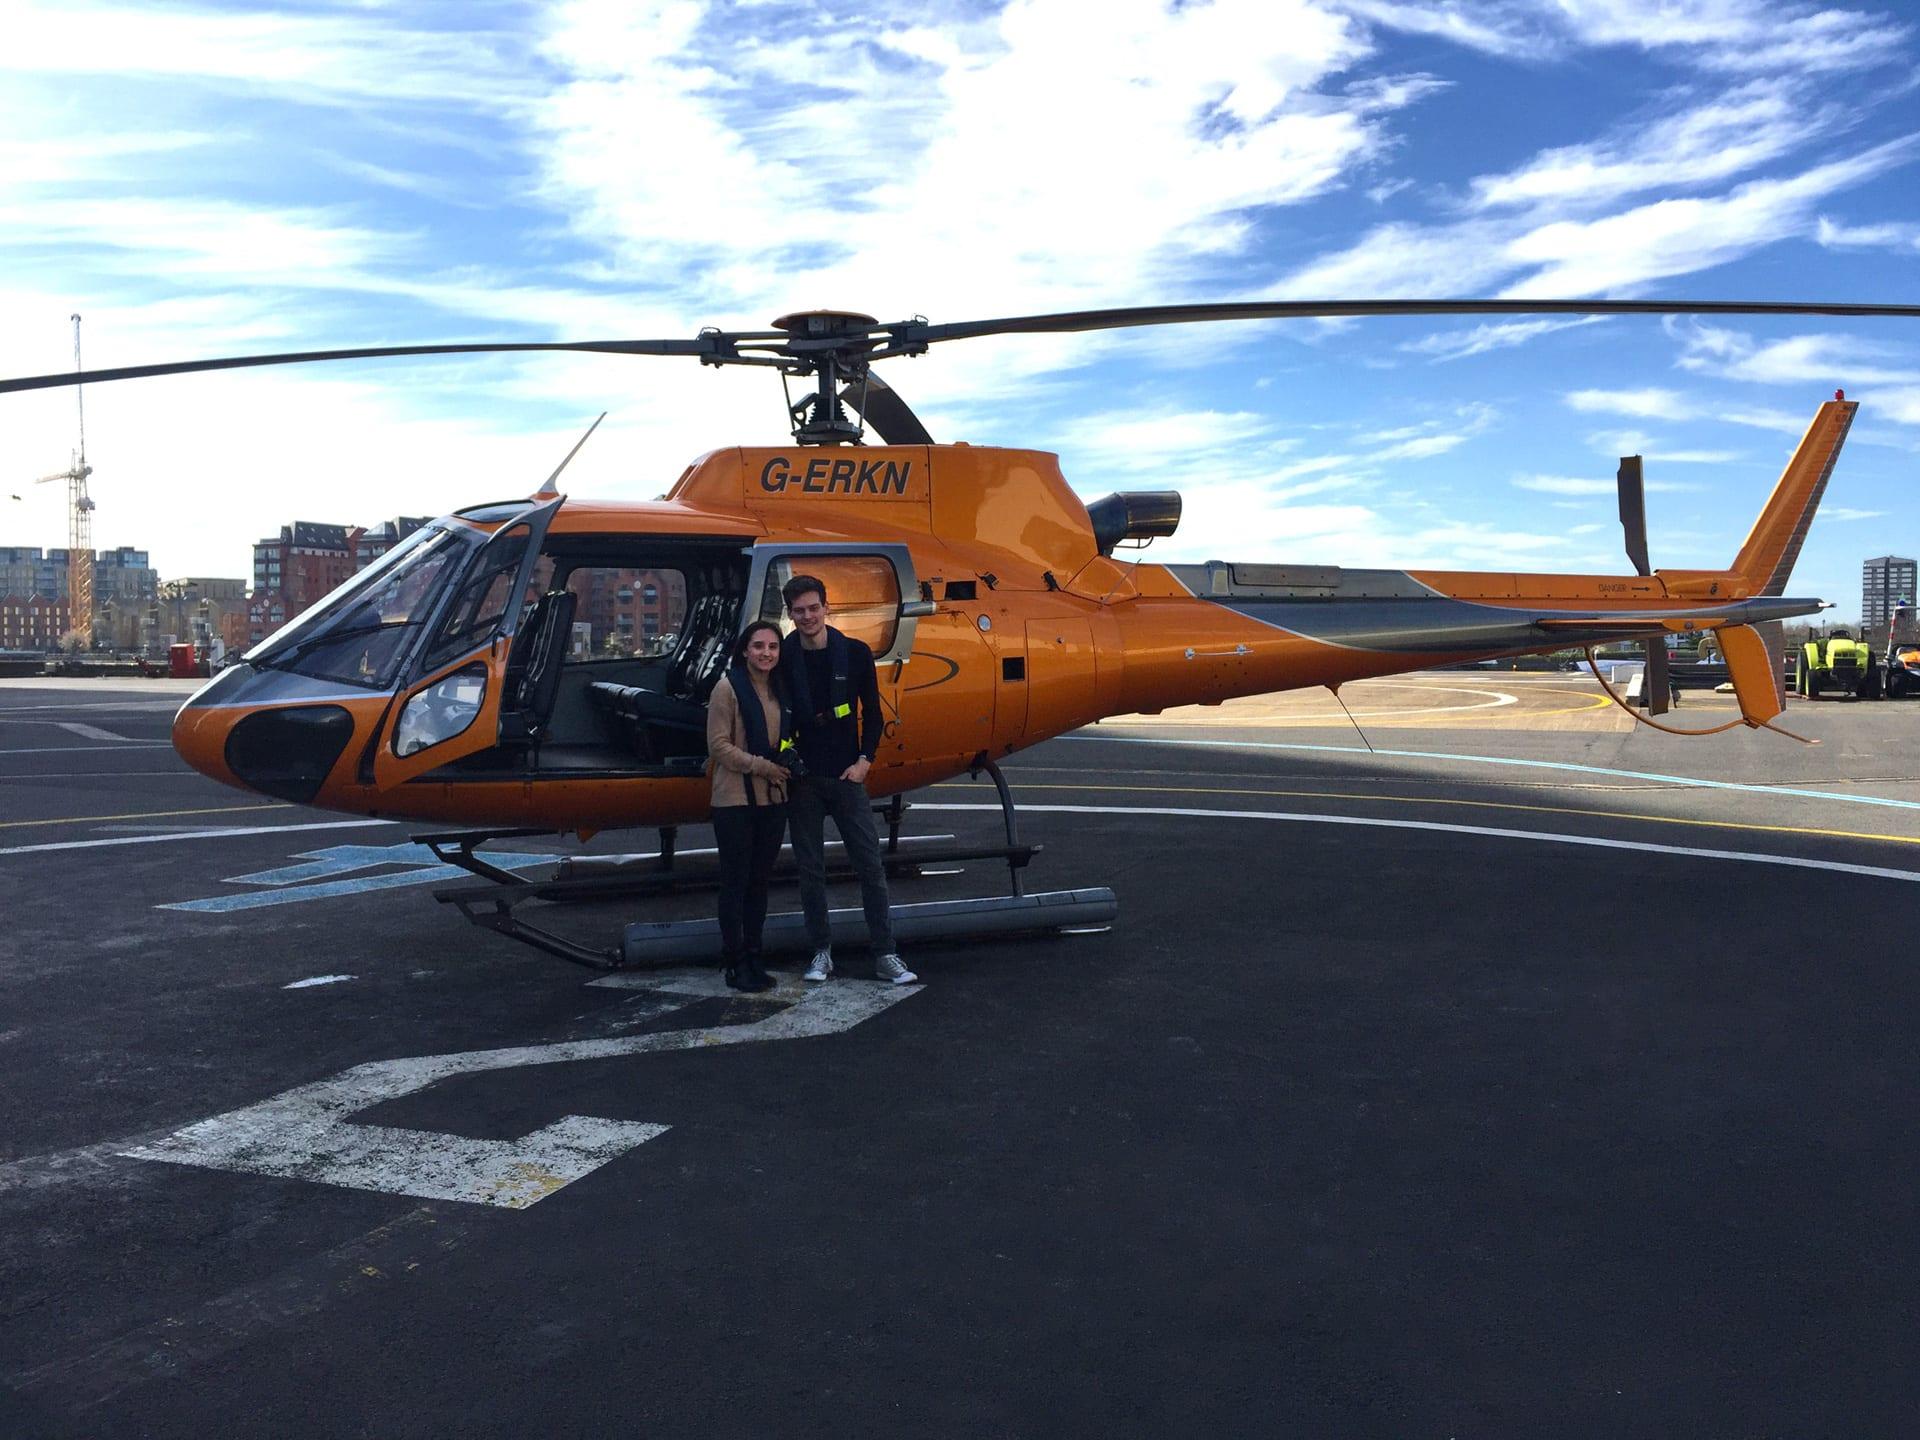 Nuestro vuelo en helicóptero en Londres: Loving London